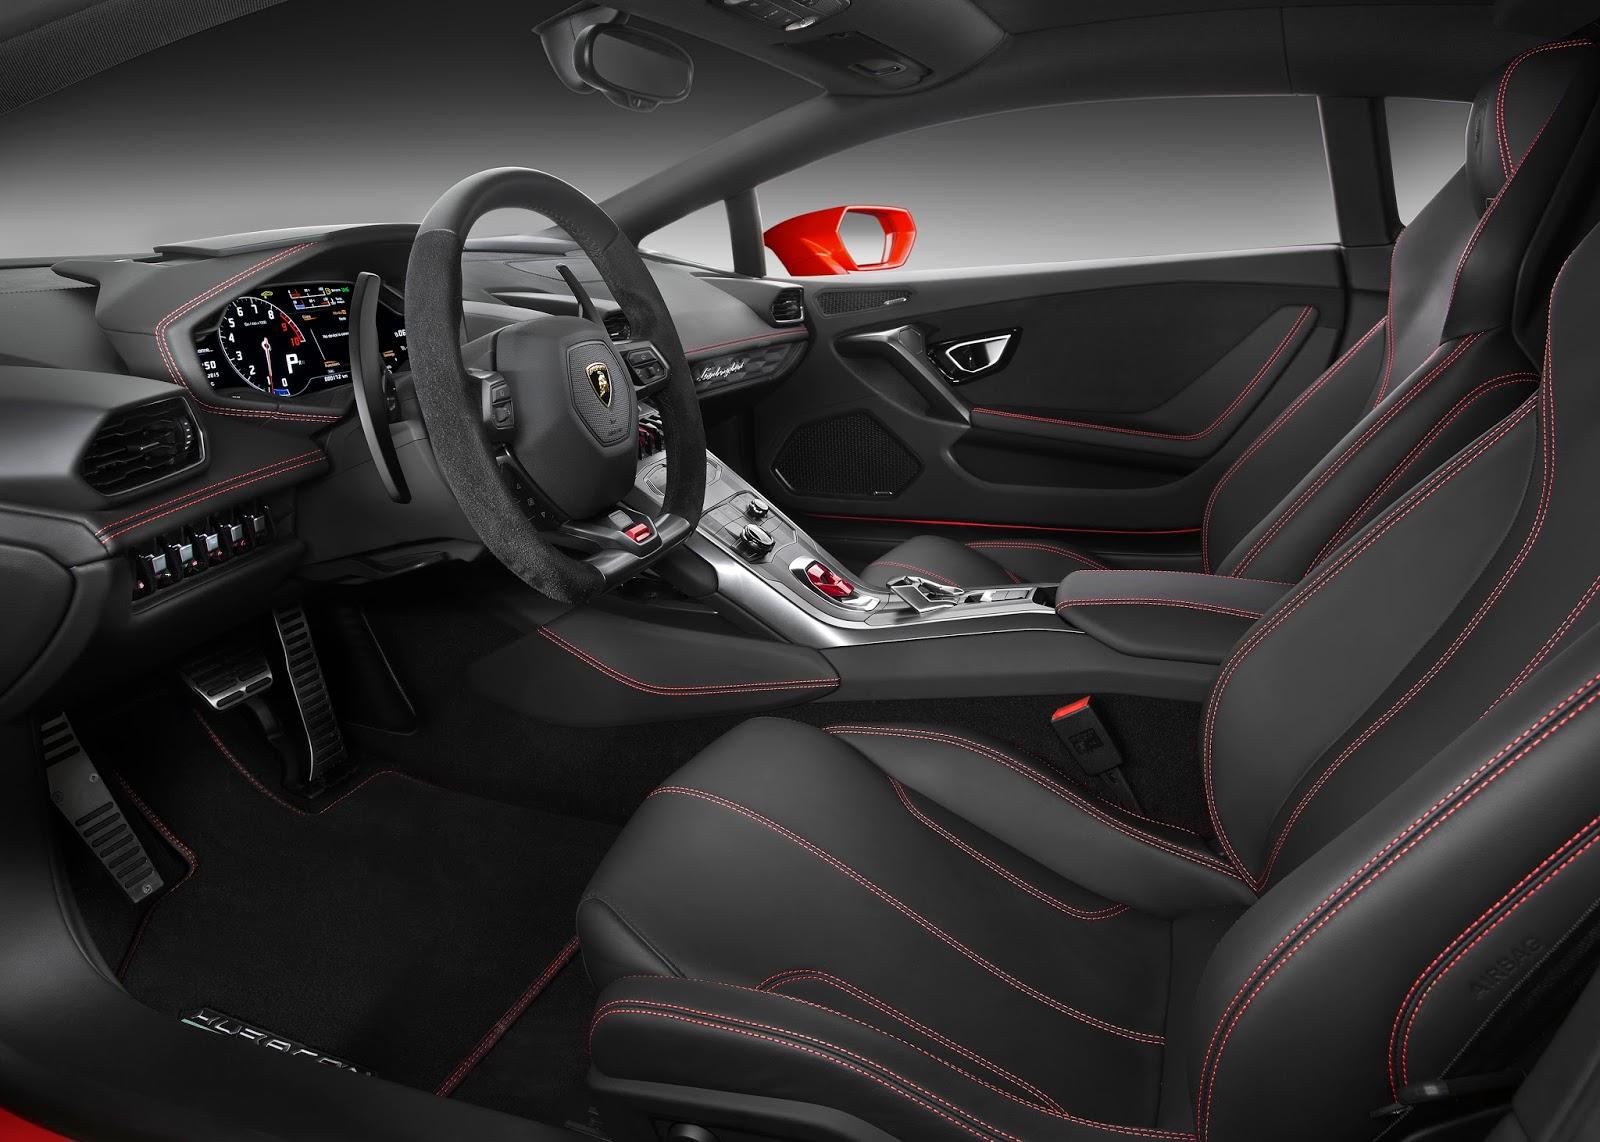 409499 Lamborghini Huracan LP580-2 : Η πιο fun to drive Lamborghini είναι πισωκίνητη και η φθηνότερη Lamborghini, Lamborghini Huracan, Lamborghini Huracan LP580-2, supercars, videos